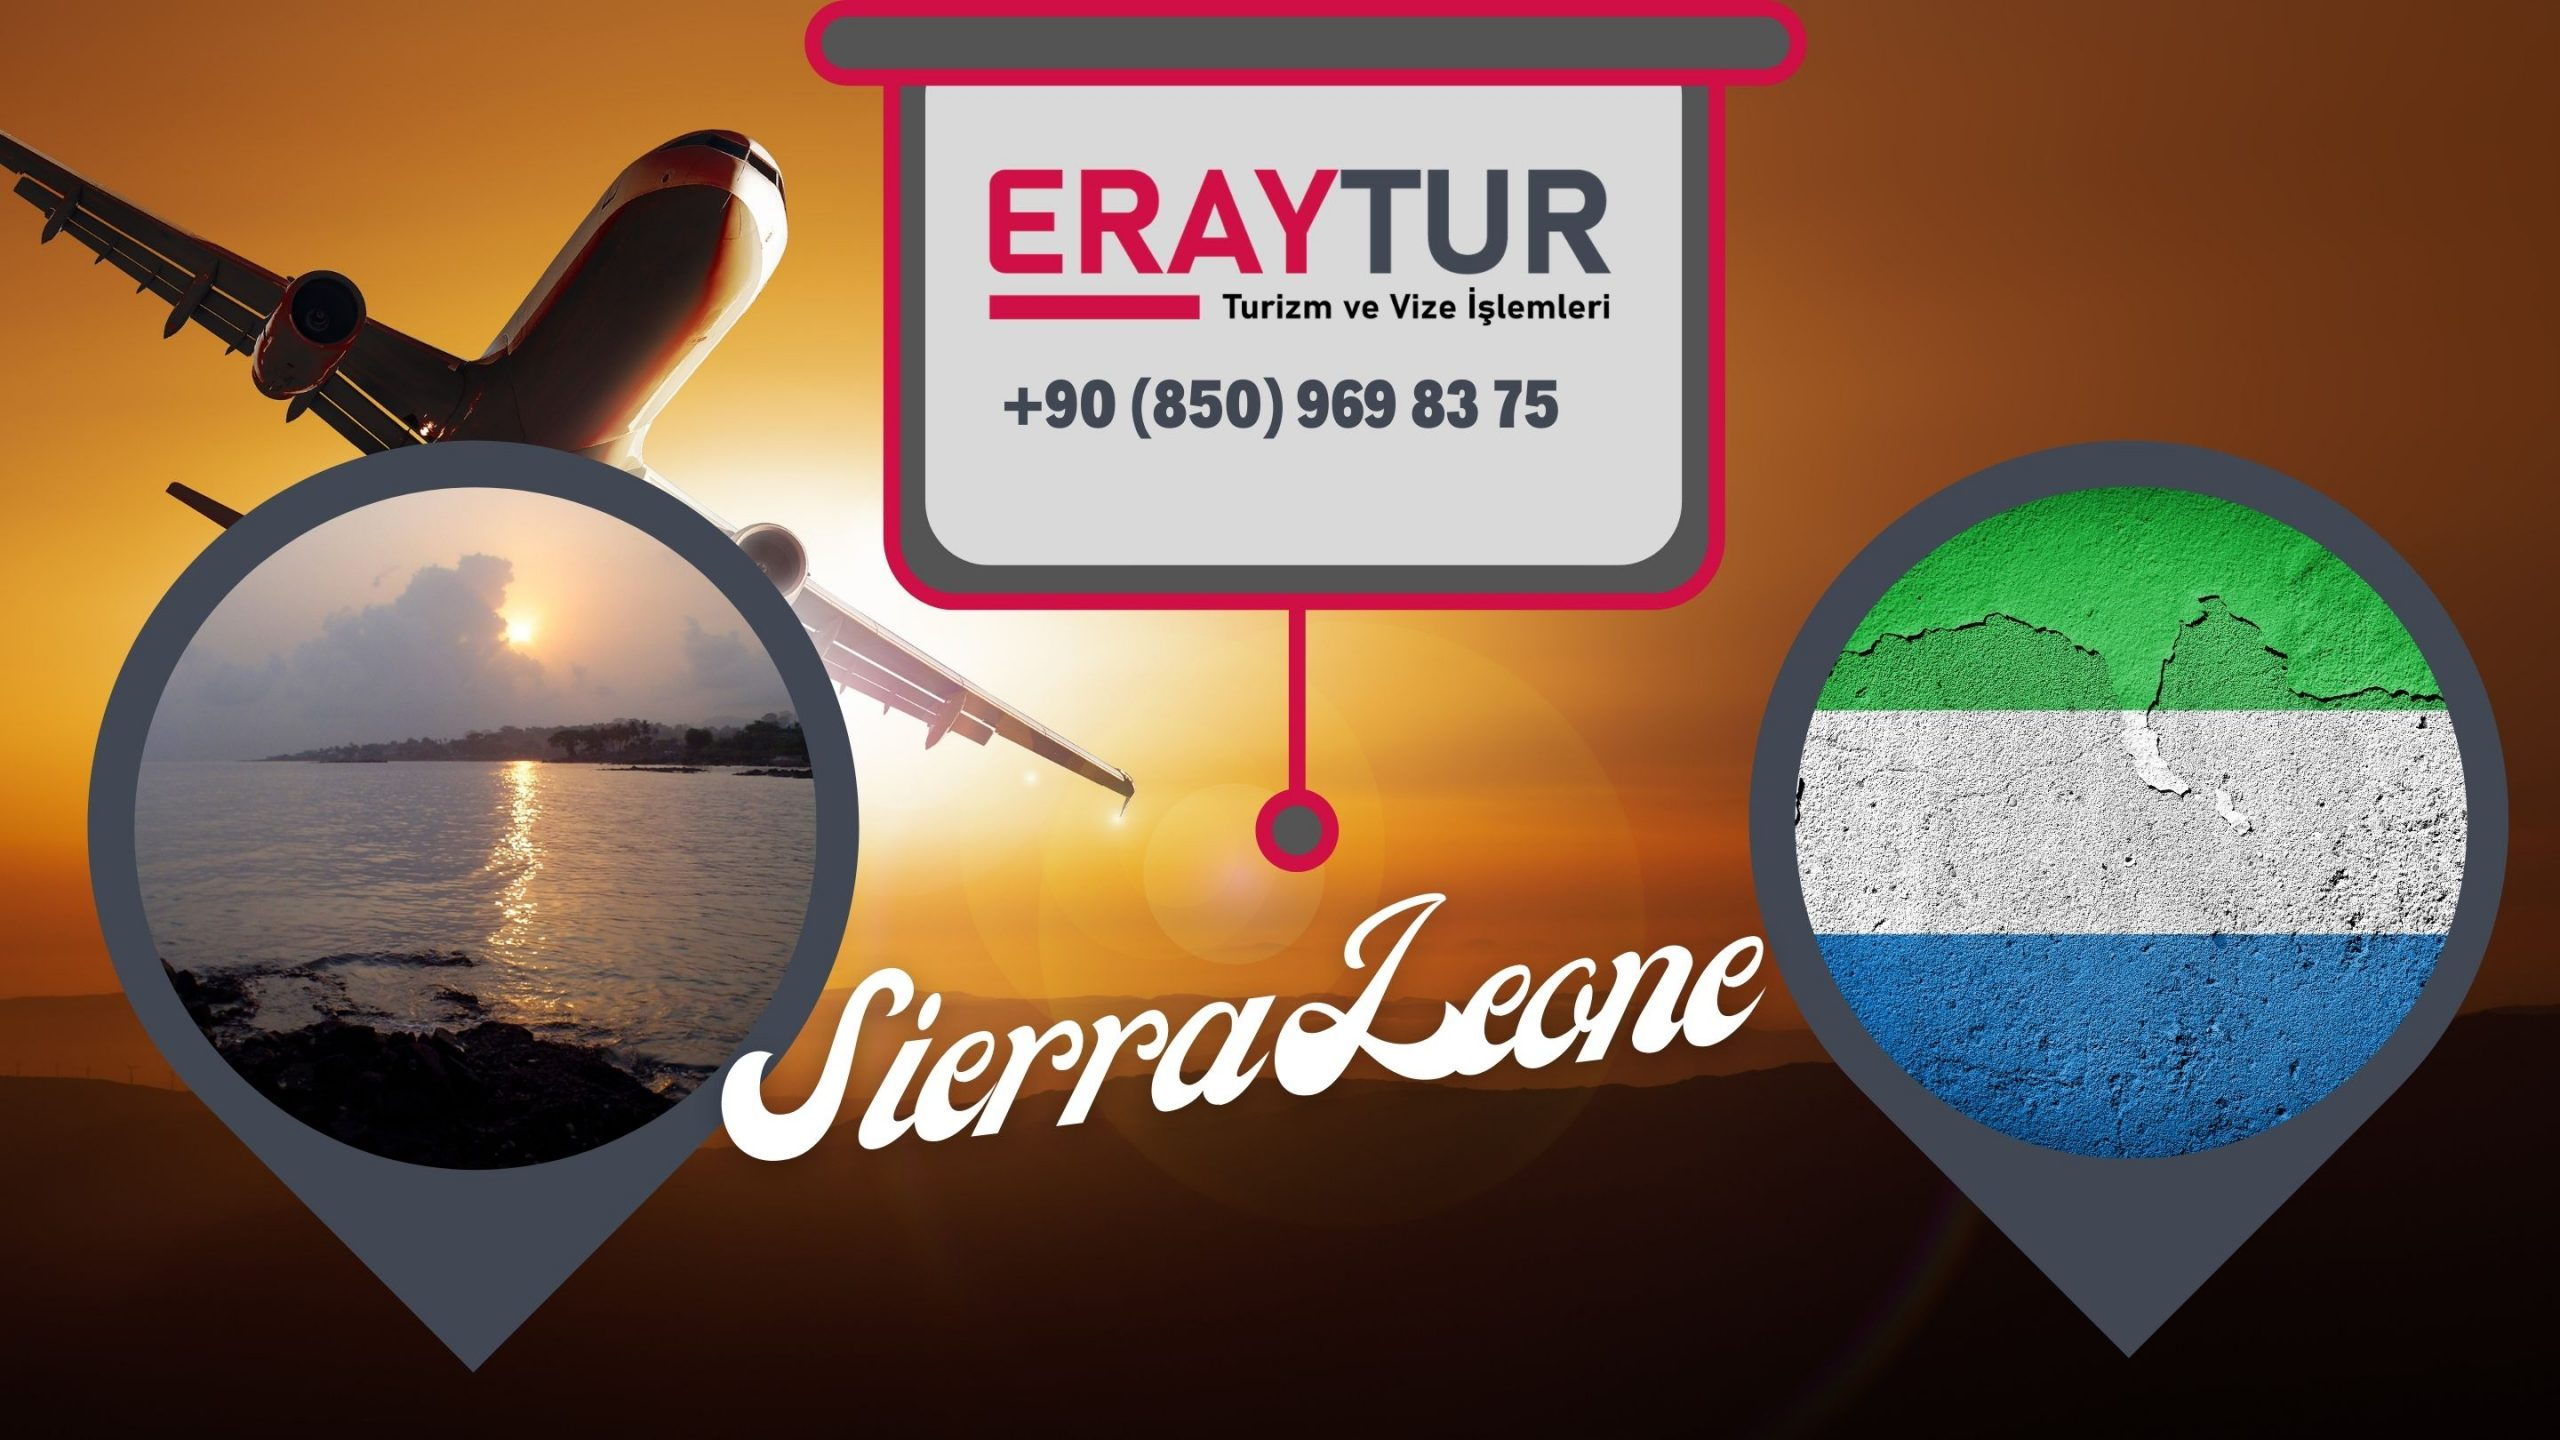 Sierra Leone Vize Ücreti